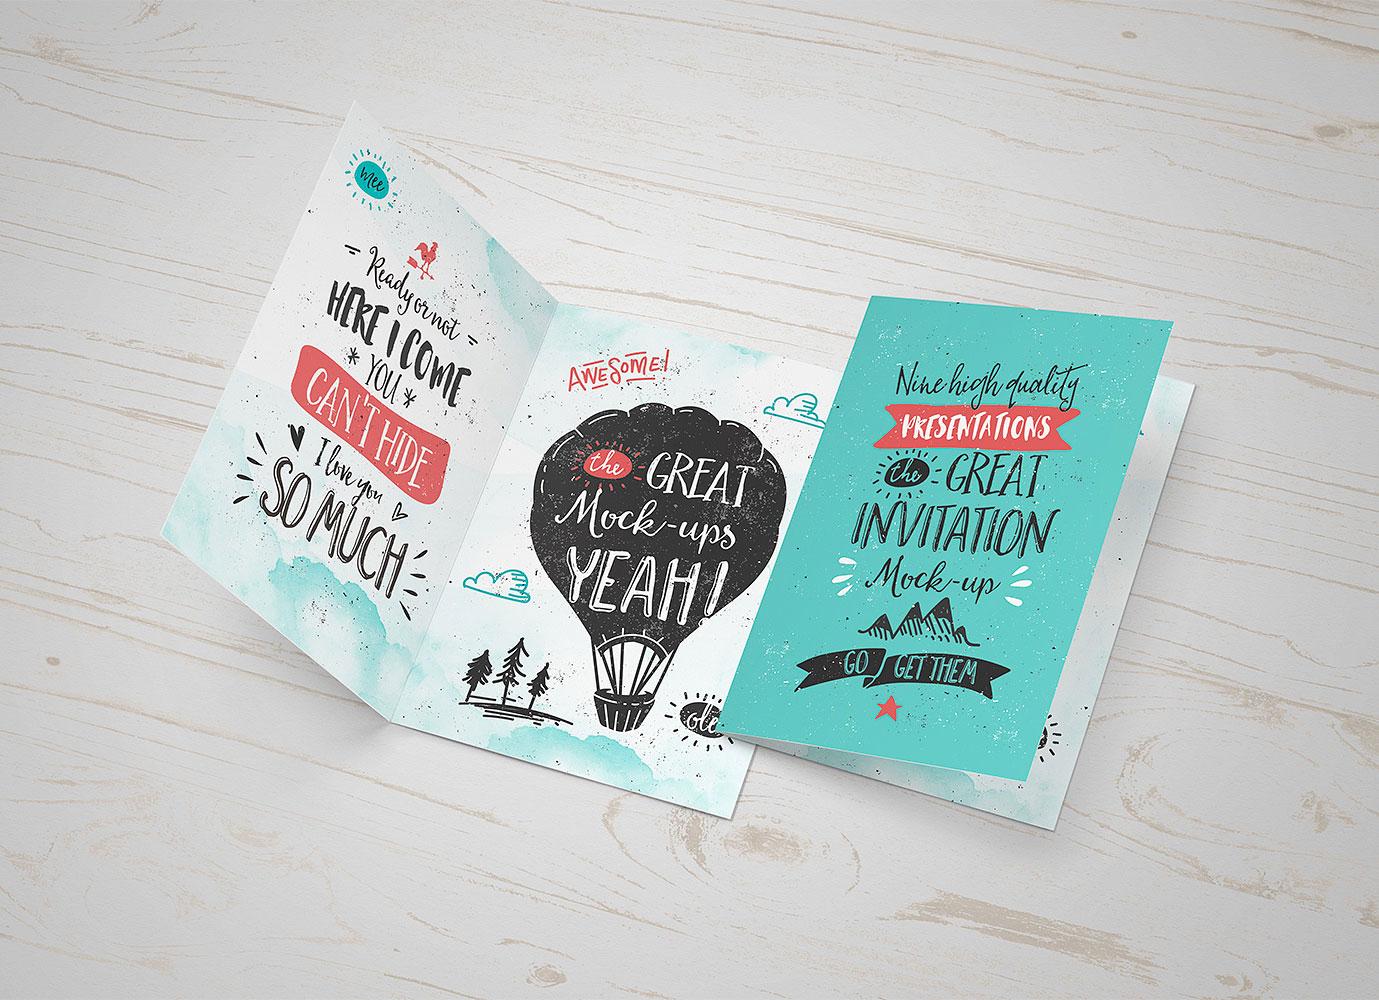 Free-Greeting-Invitation-Card-Mockup-PSD-2